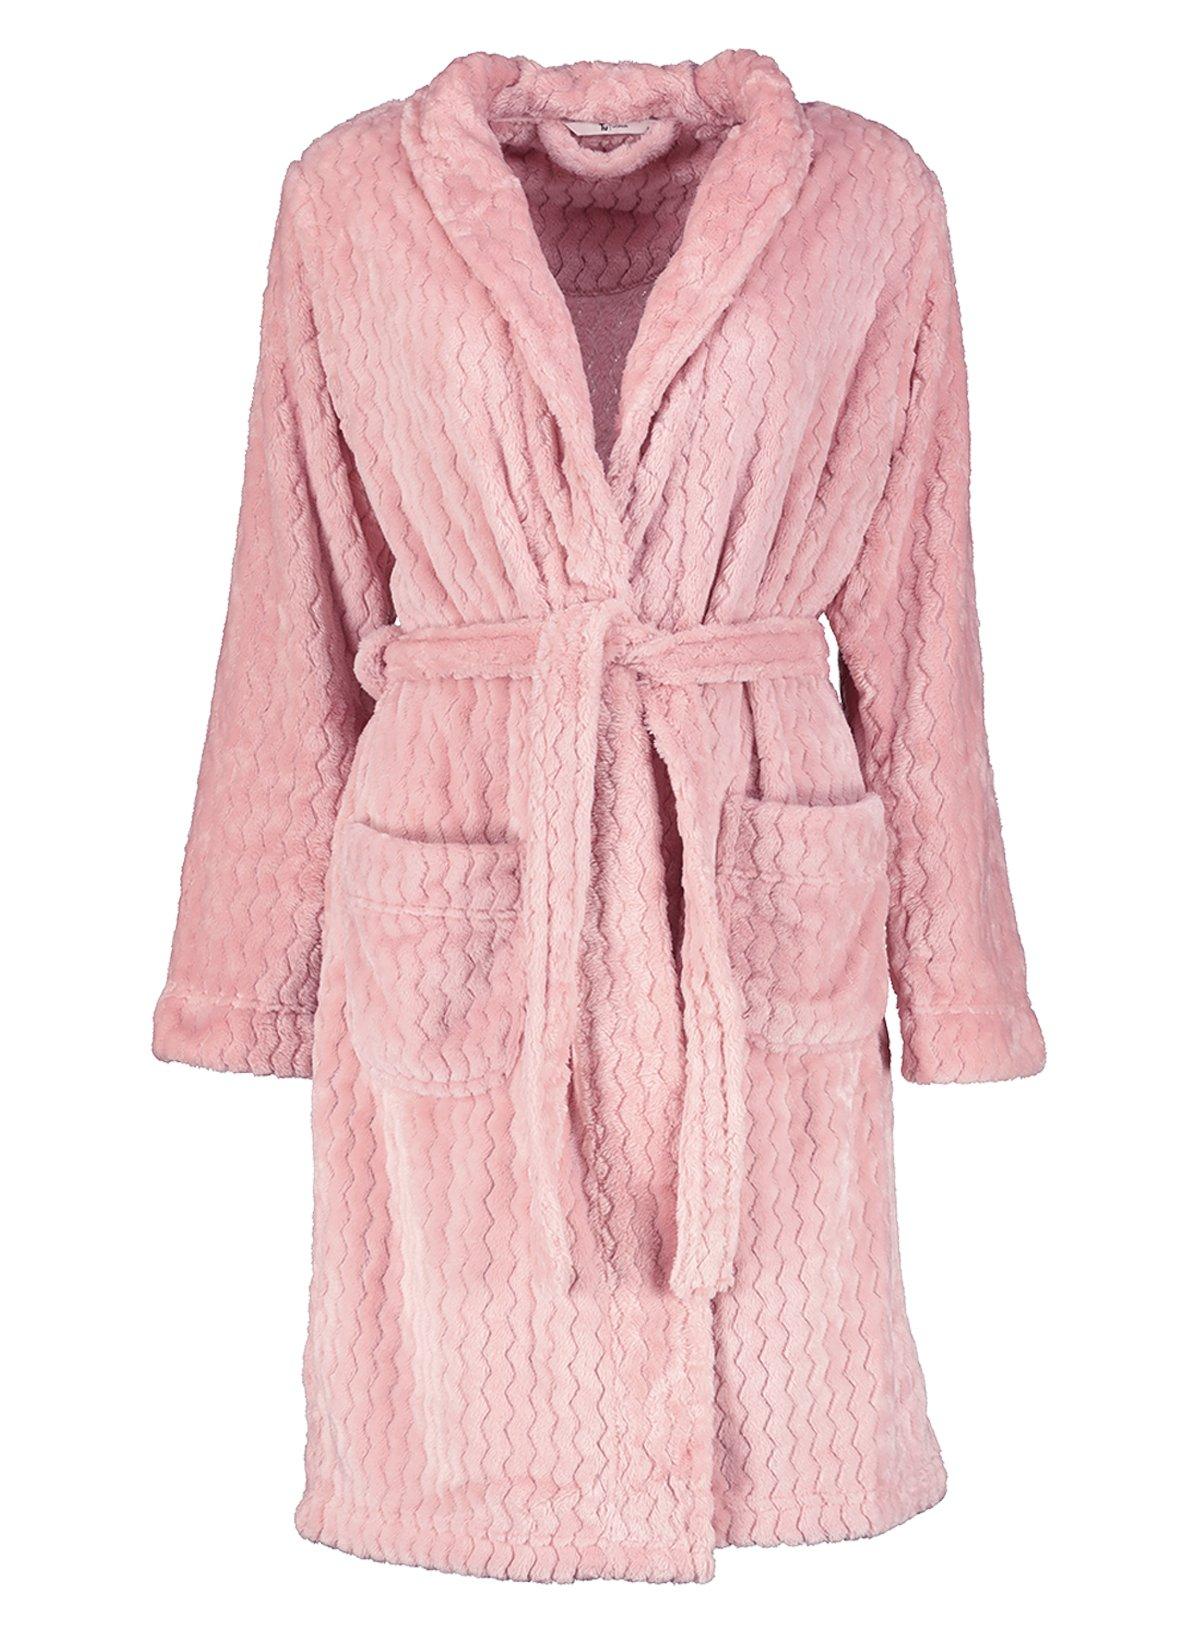 Pink Fleece Dressing Gown XS / XXL - £7.50 @ Argos